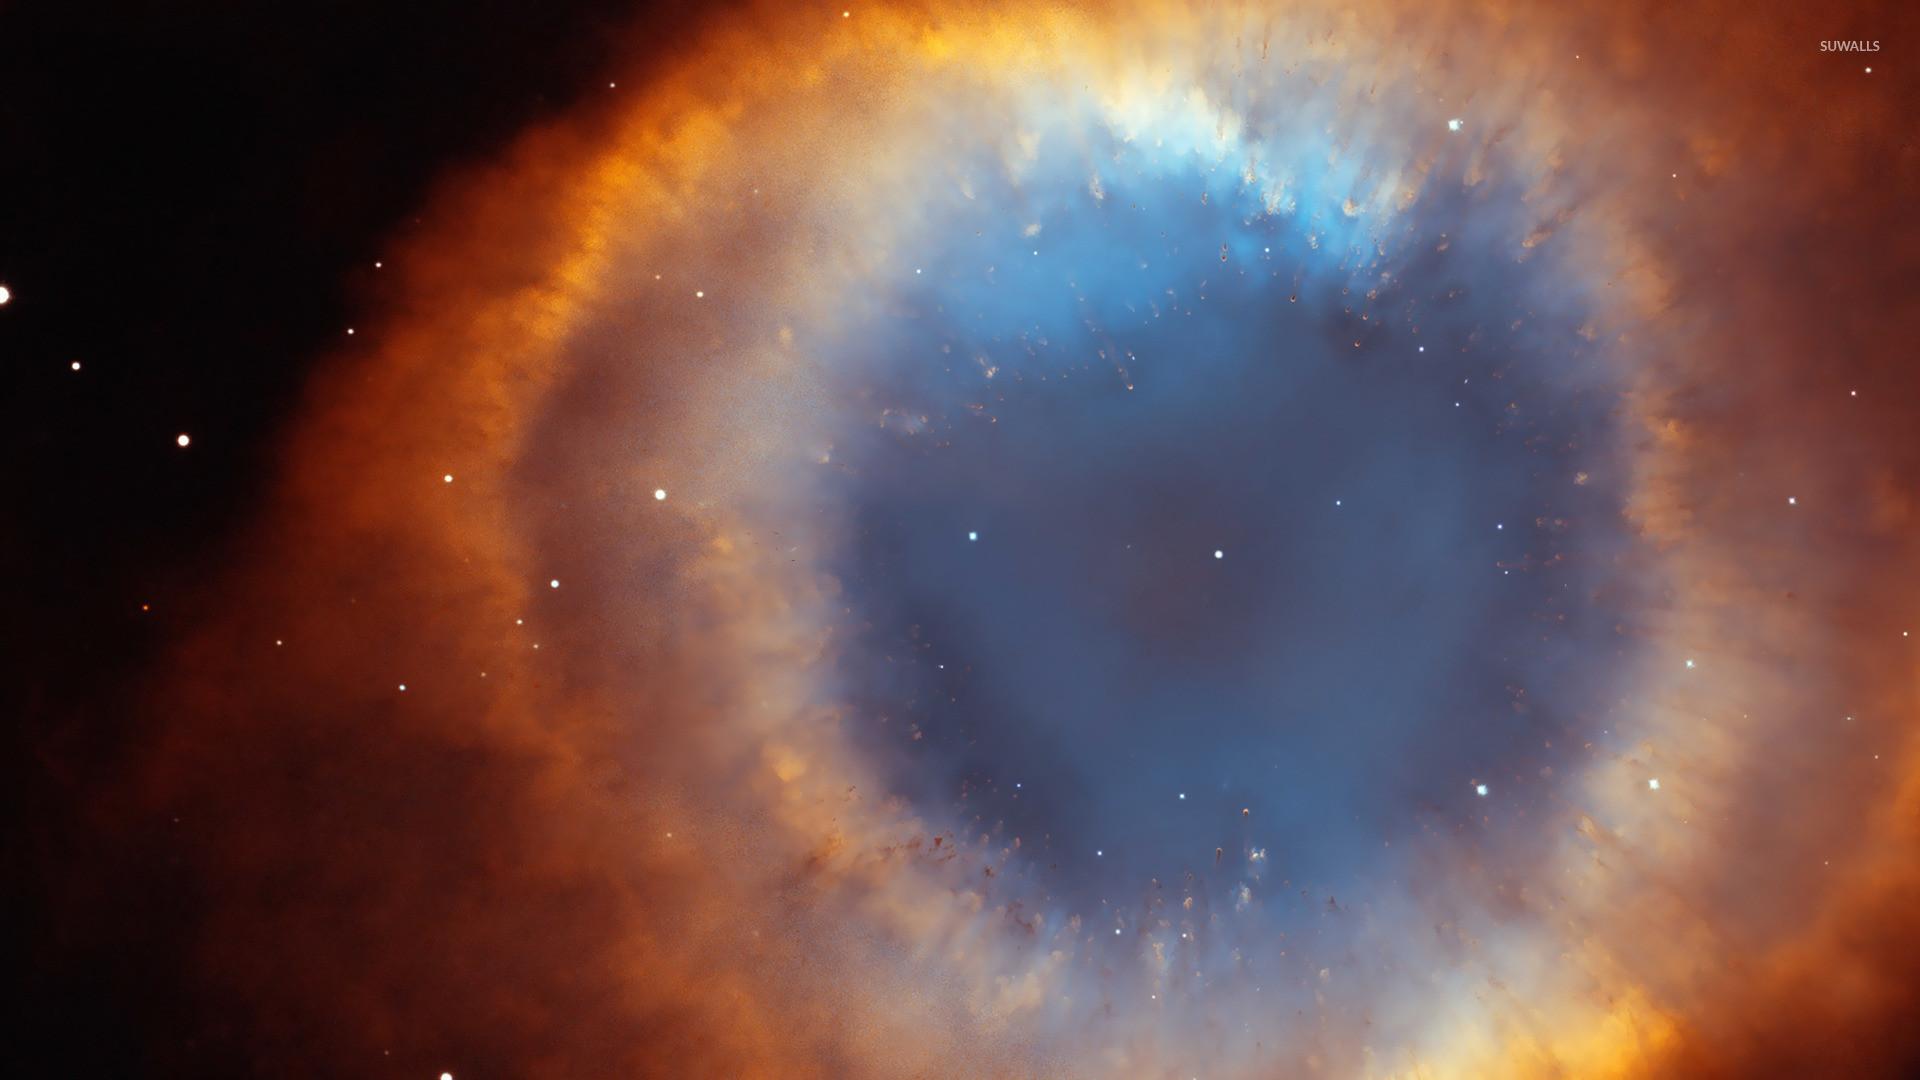 Helix nebula HD Wide Wallpaper for Widescreen (68 Wallpapers)